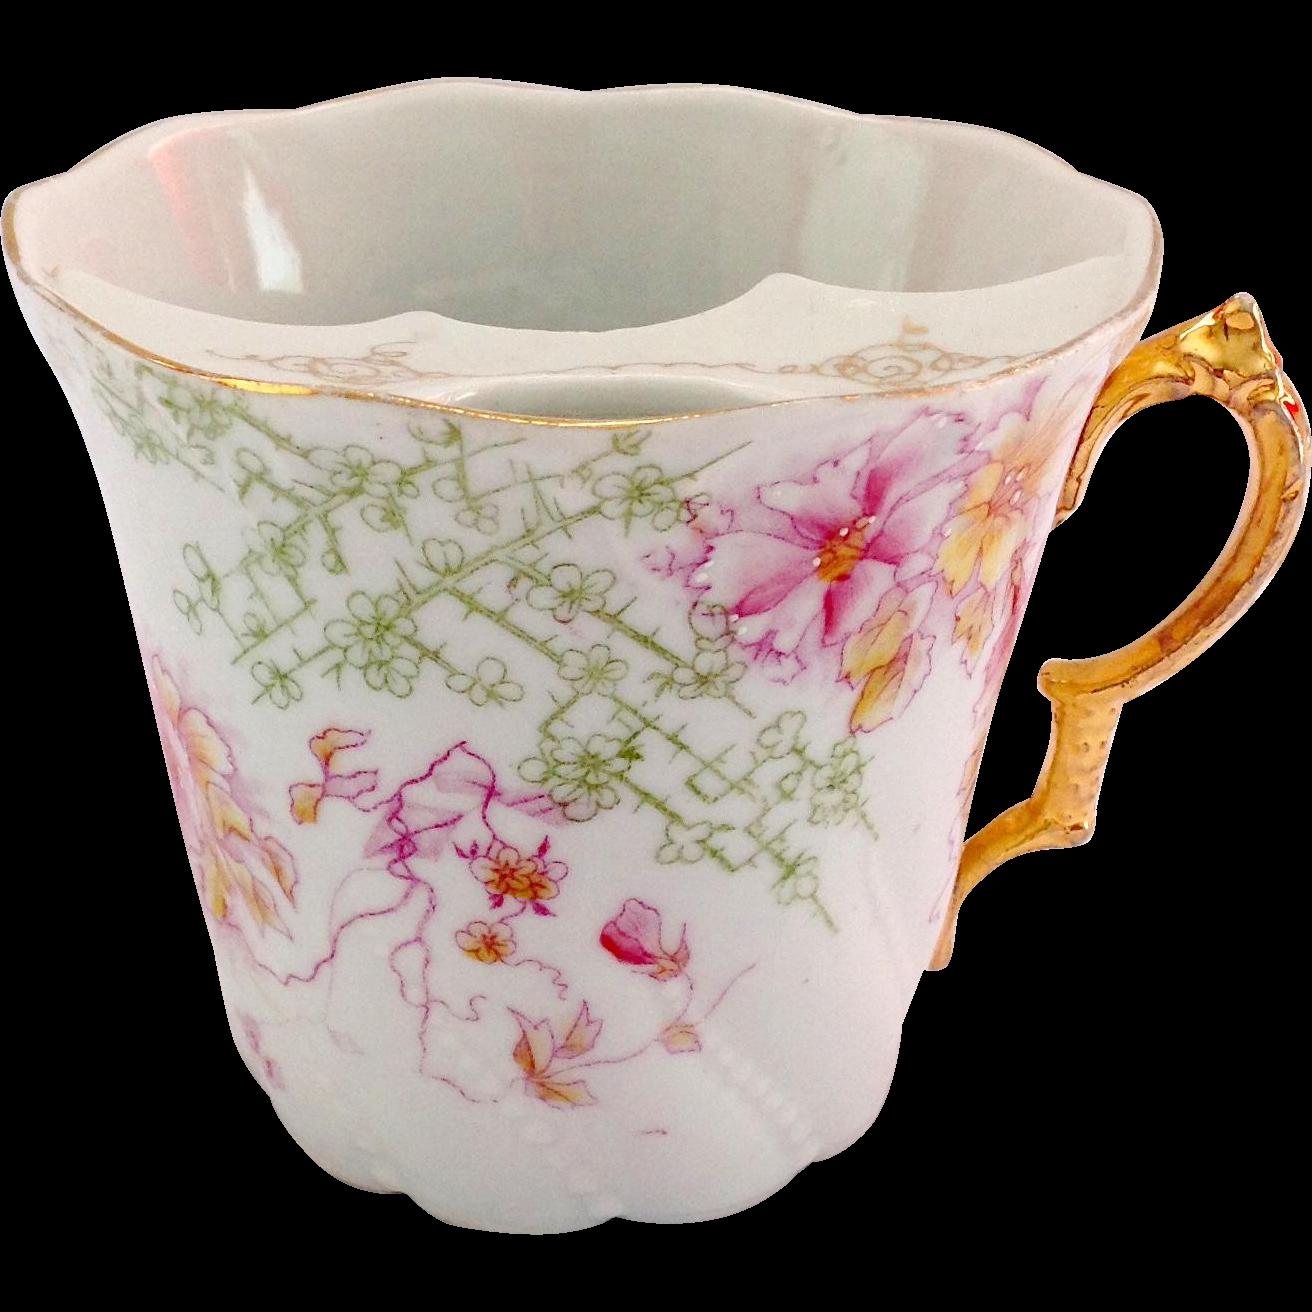 Porcelain Mustache Cup Pink Florals Circa Late 1800s